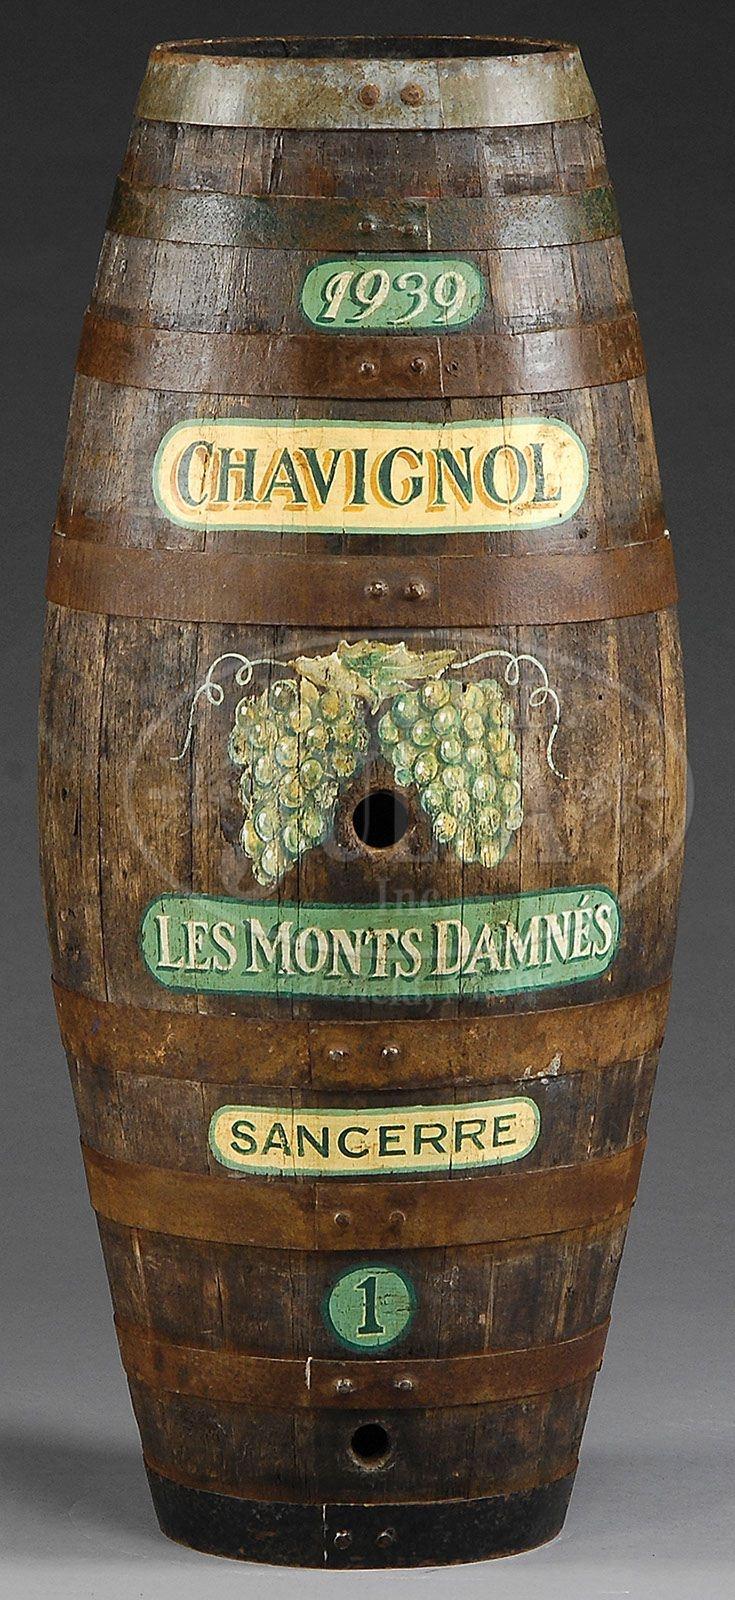 stacked oak barrels maturing red wine. oak iron bound wine barrel. stacked oak barrels maturing red wine